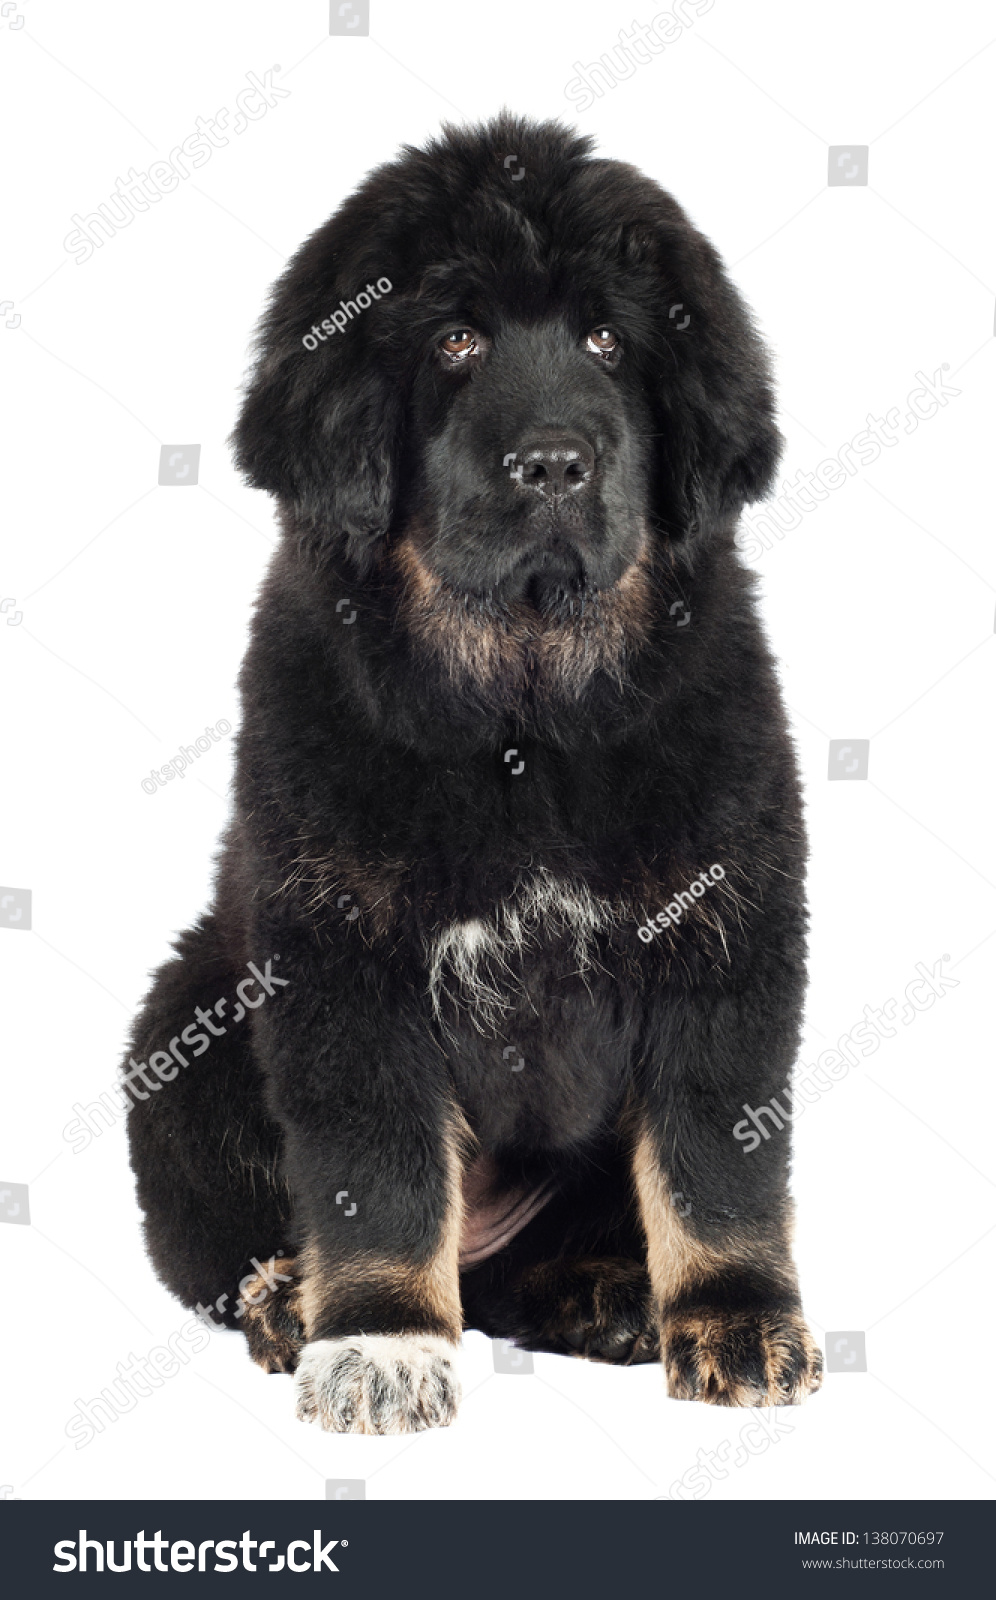 Adorabole Black Tibetan Mastiff Puppy Stock Photo ...